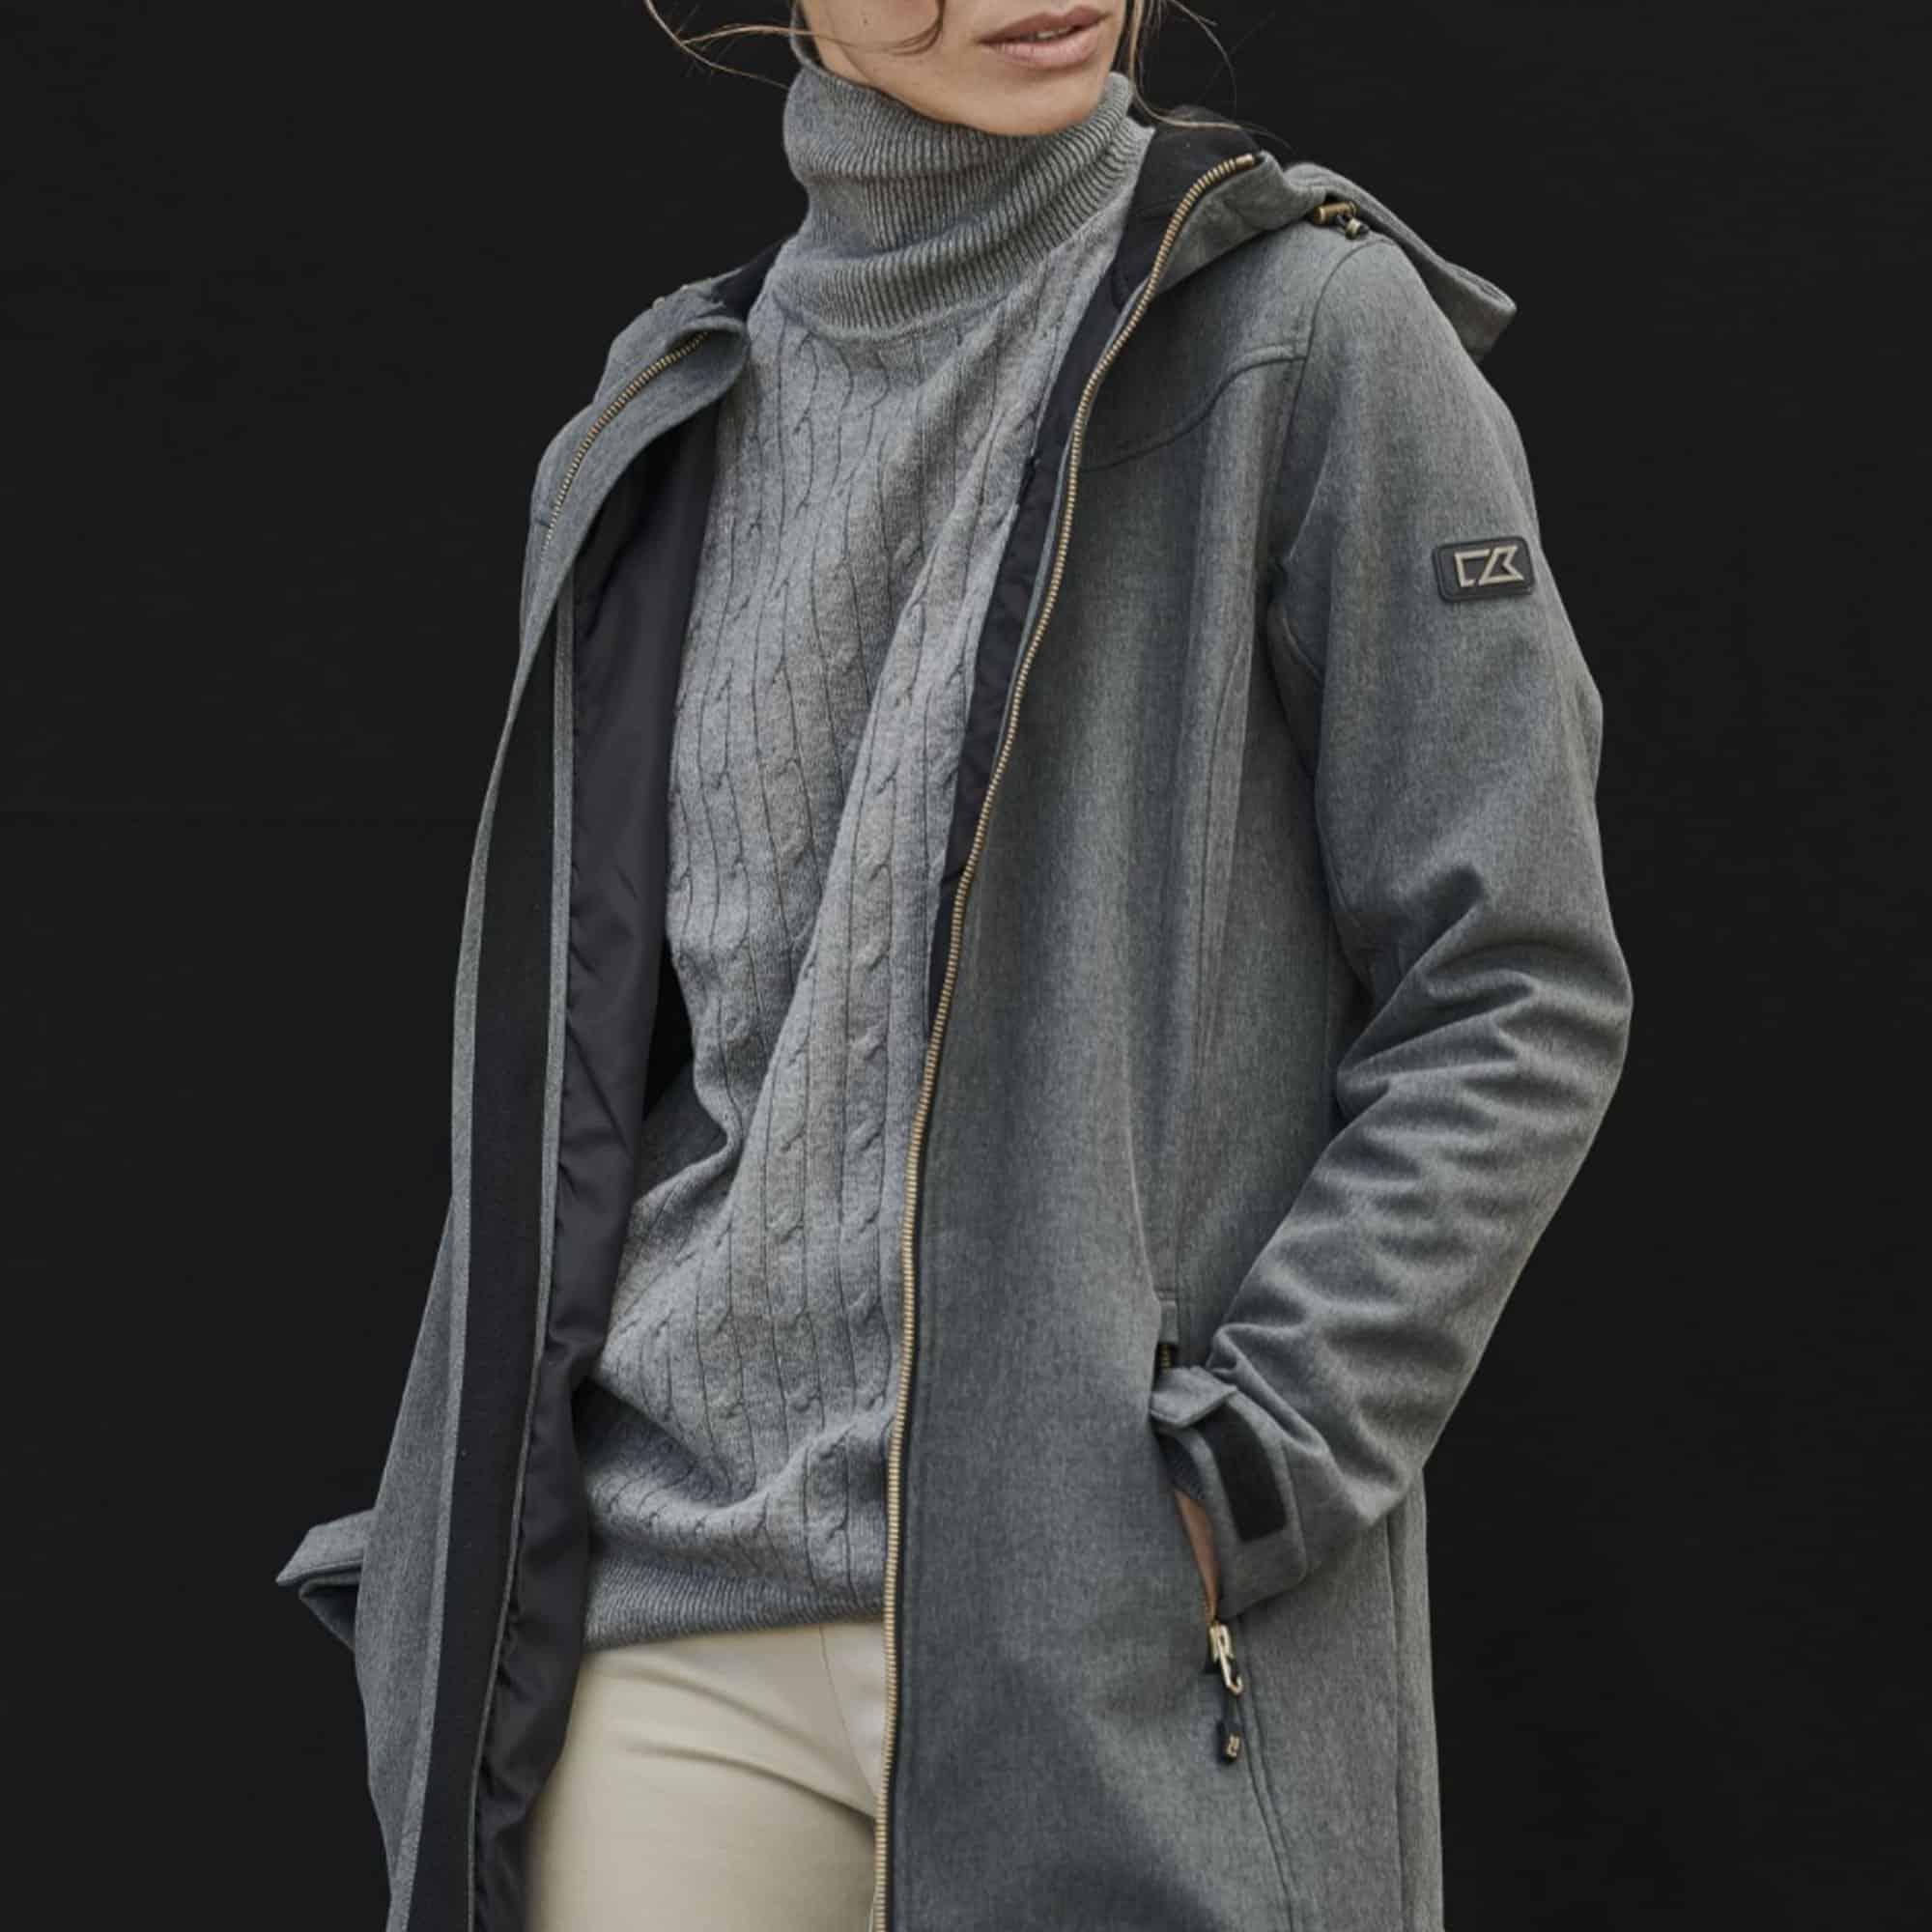 whittier jacket